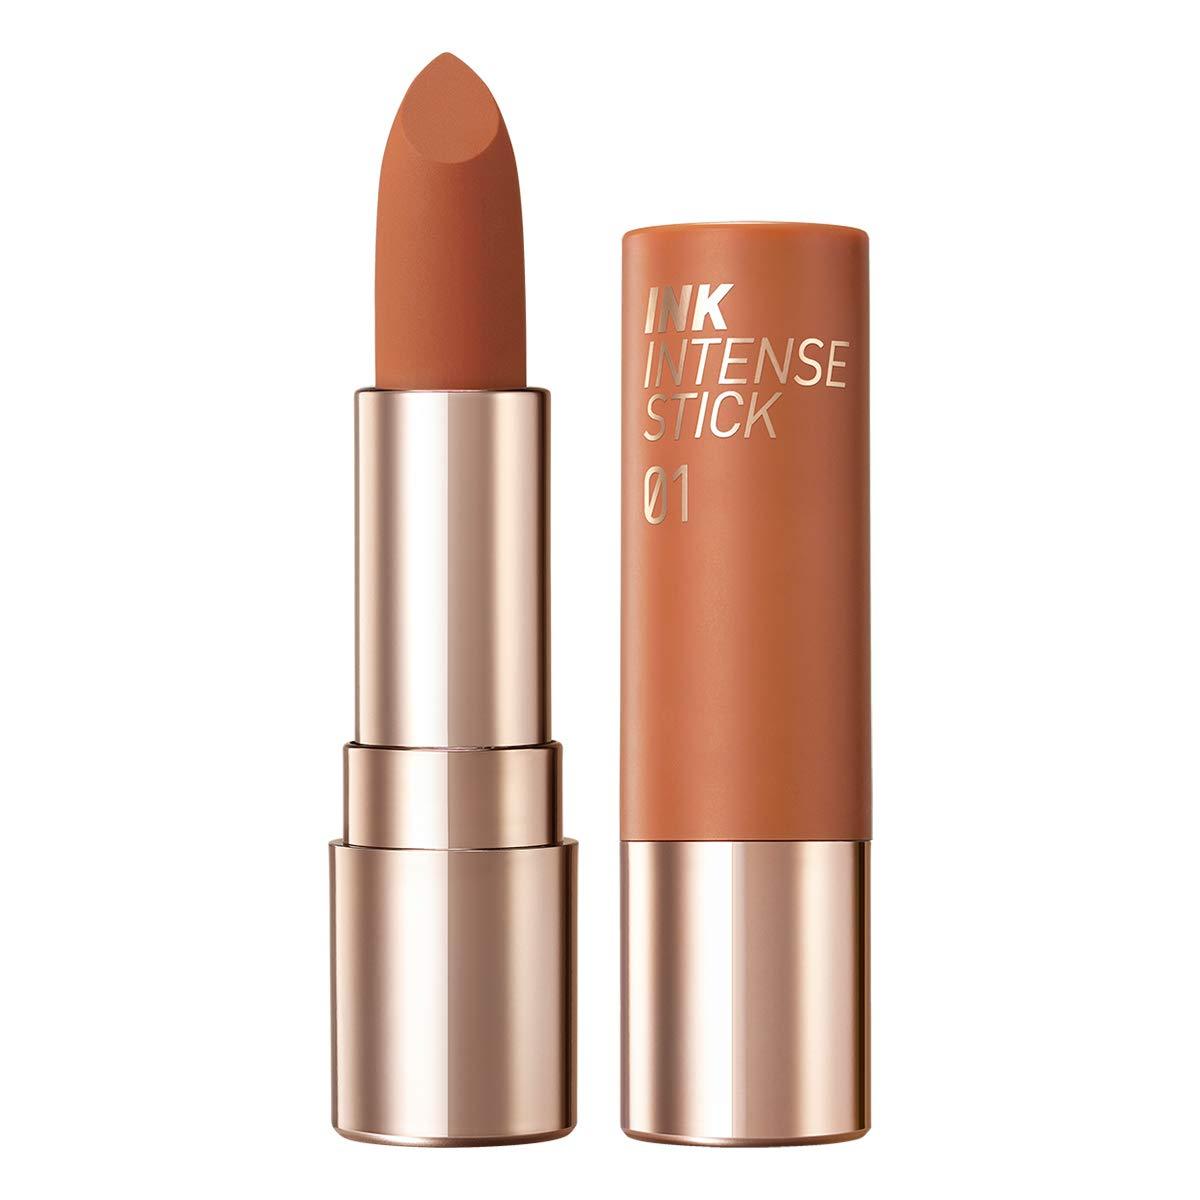 Peripera Ink Velvet Intense Lipstick | Matte Longwear, Super Stay, Comfortable Velvet Lipstick | #01 Soft Beige